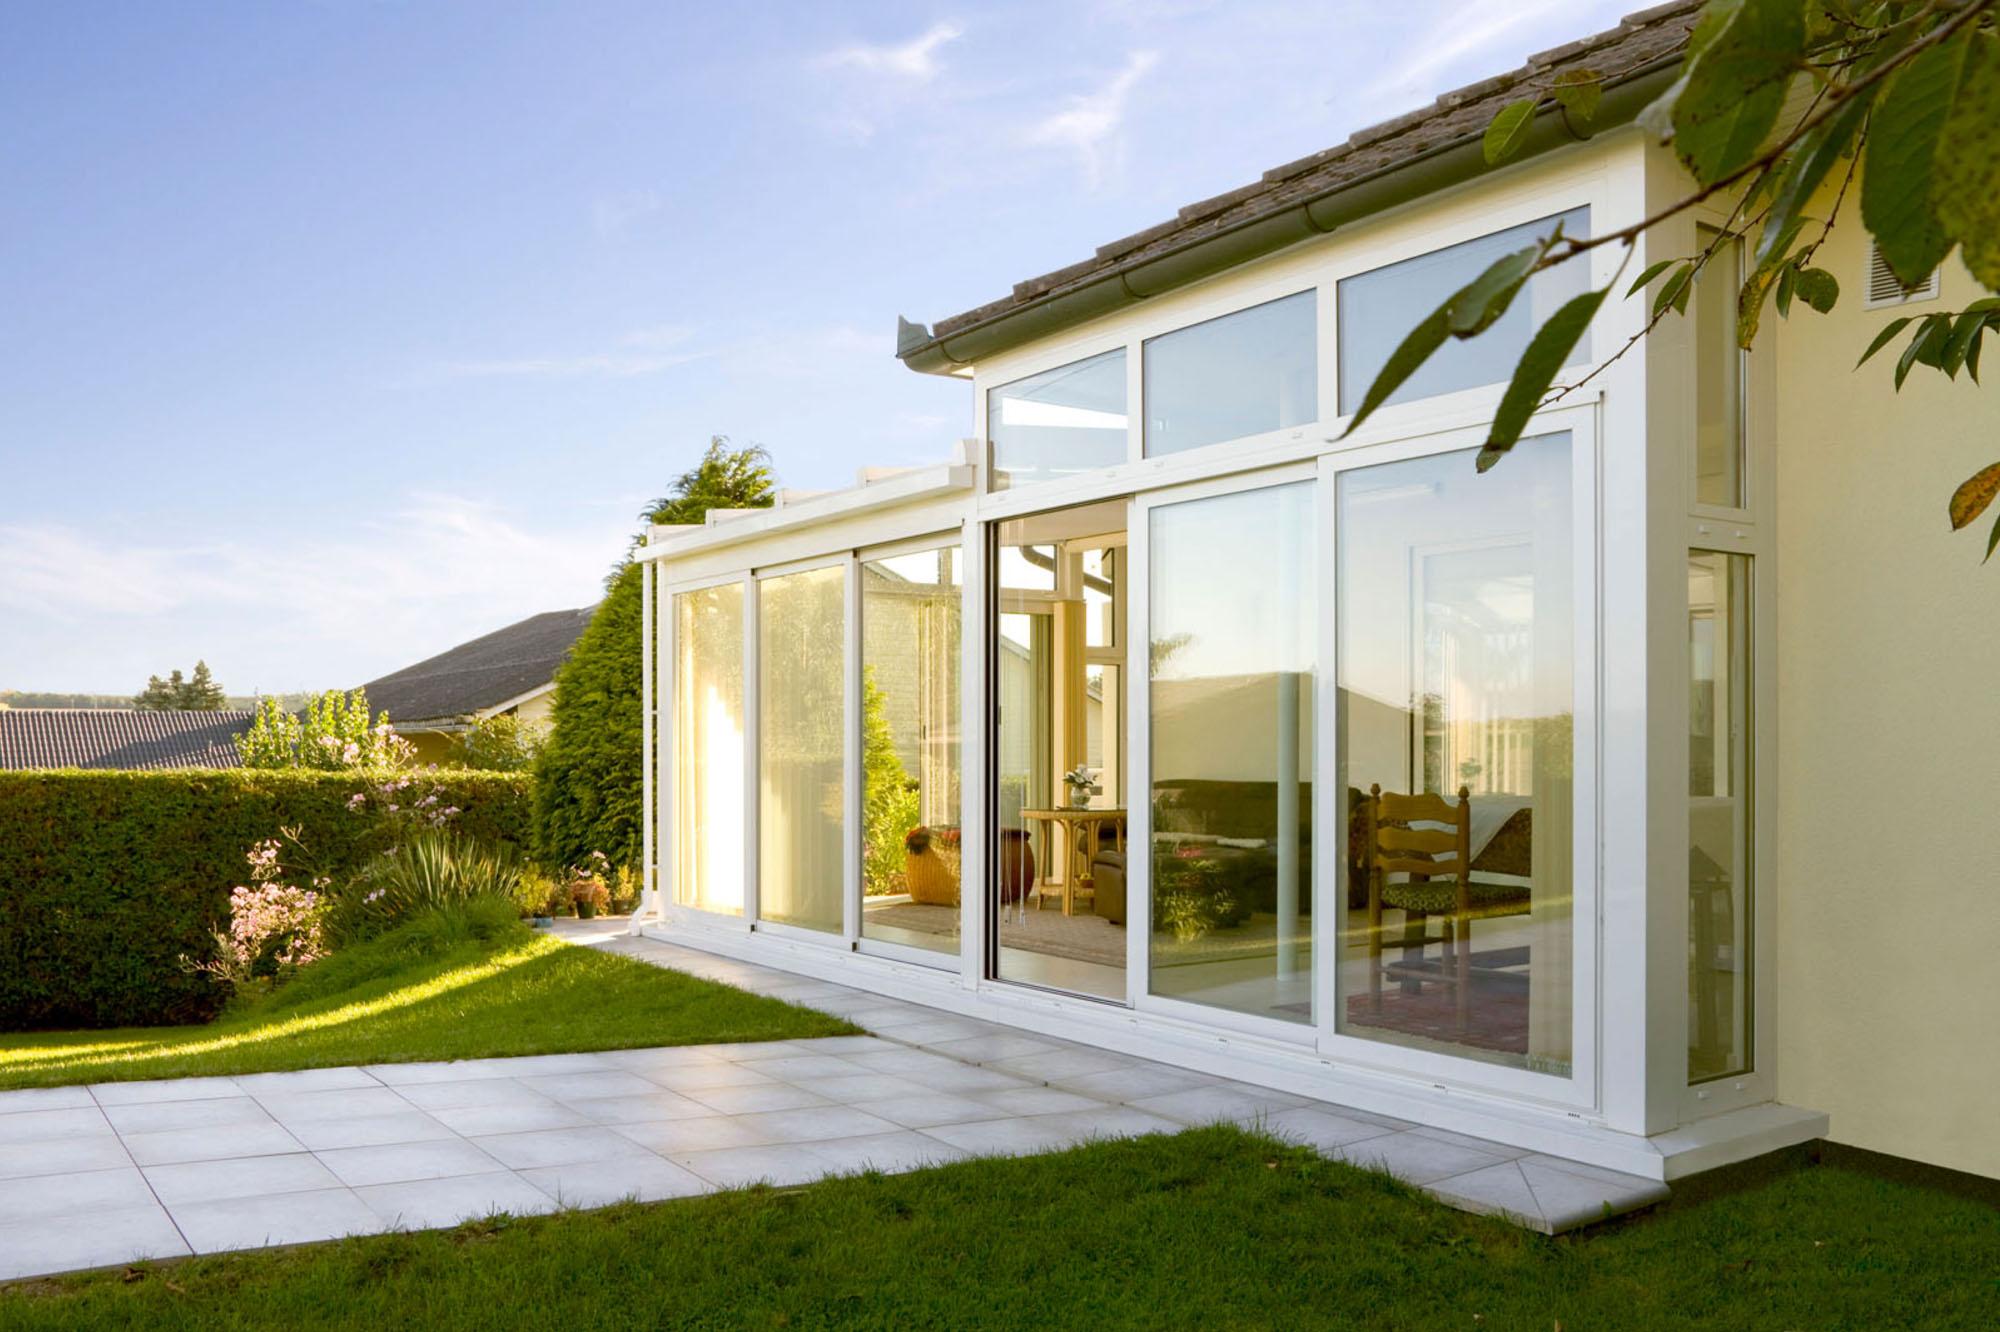 weißer Wintergarten - Classic passt sich maßgeschneidert an ihr Gebäude an